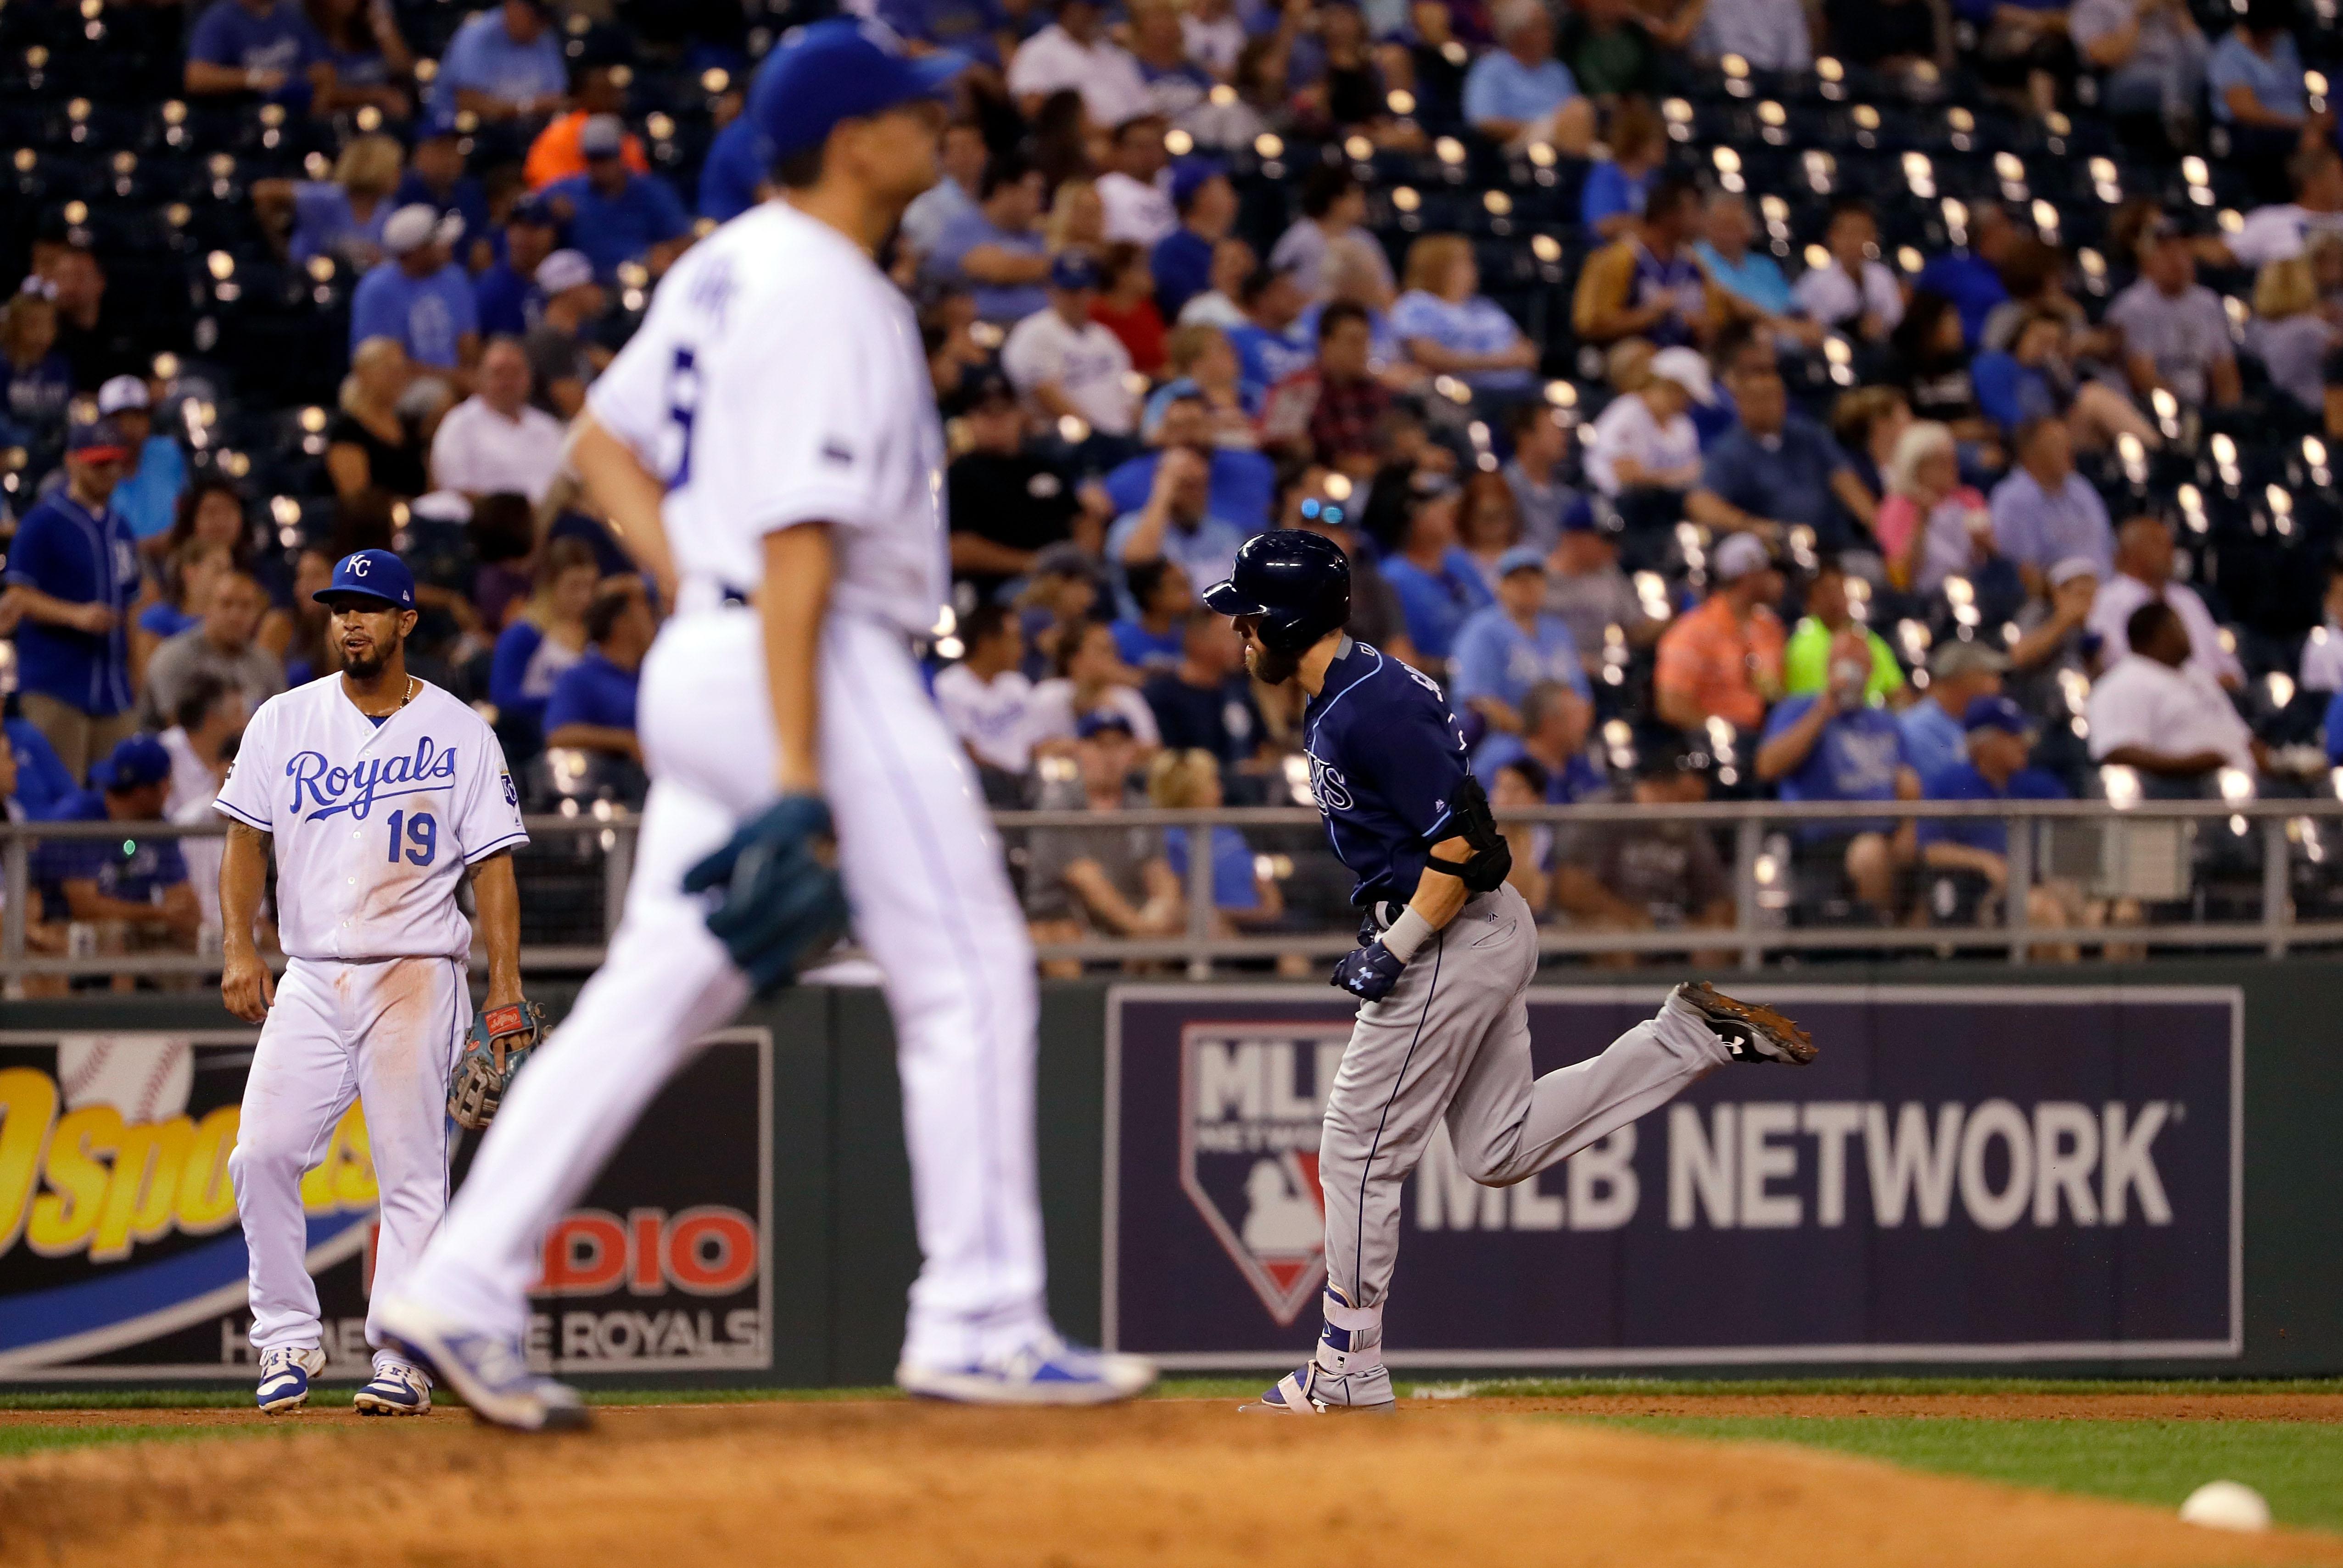 Tampa Bay Rays v Kansas City Royals